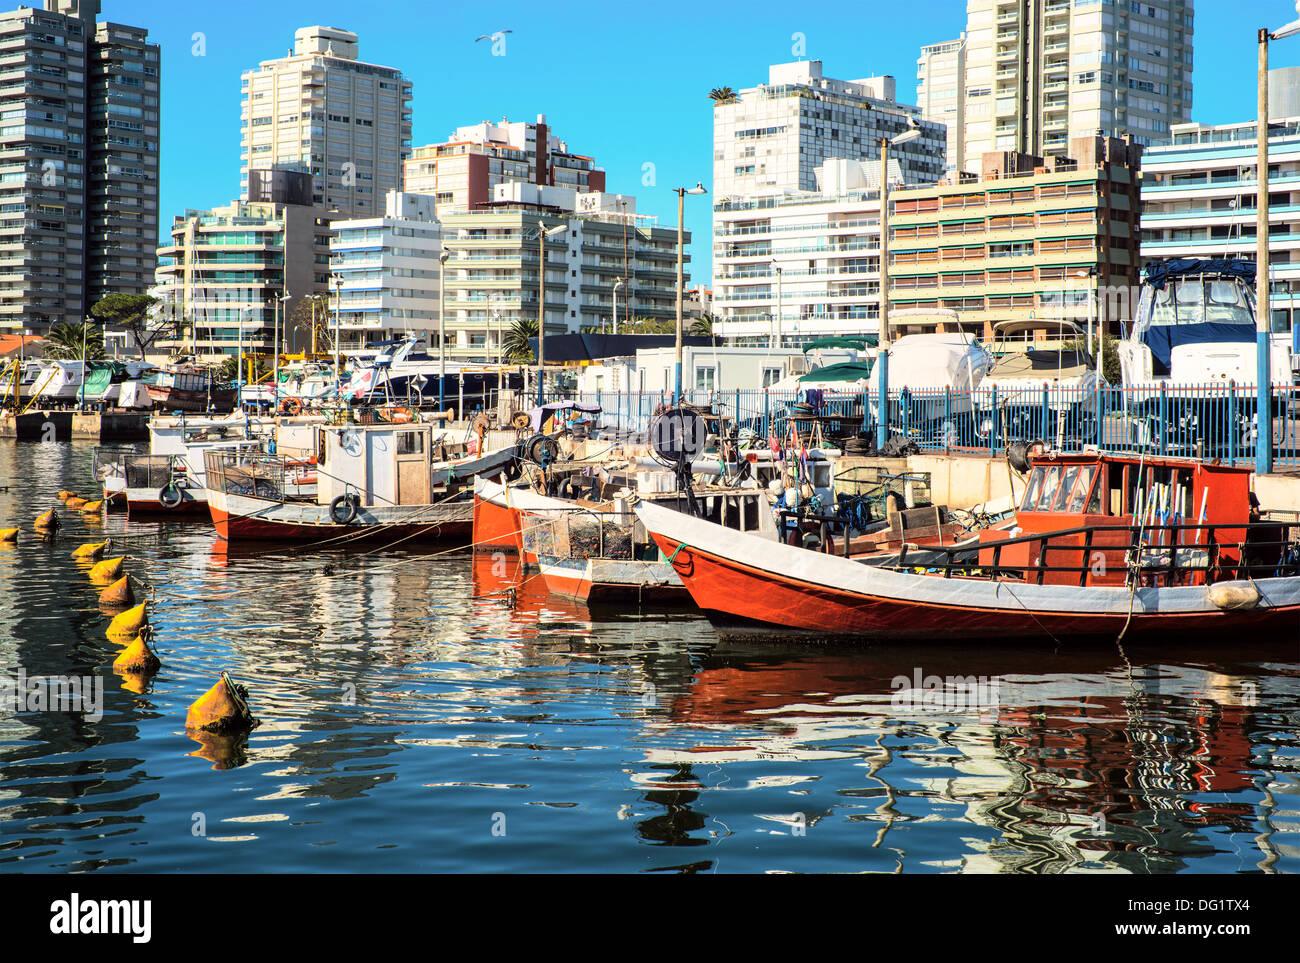 Fishing boats, Punta del Este, Uruguay - Stock Image